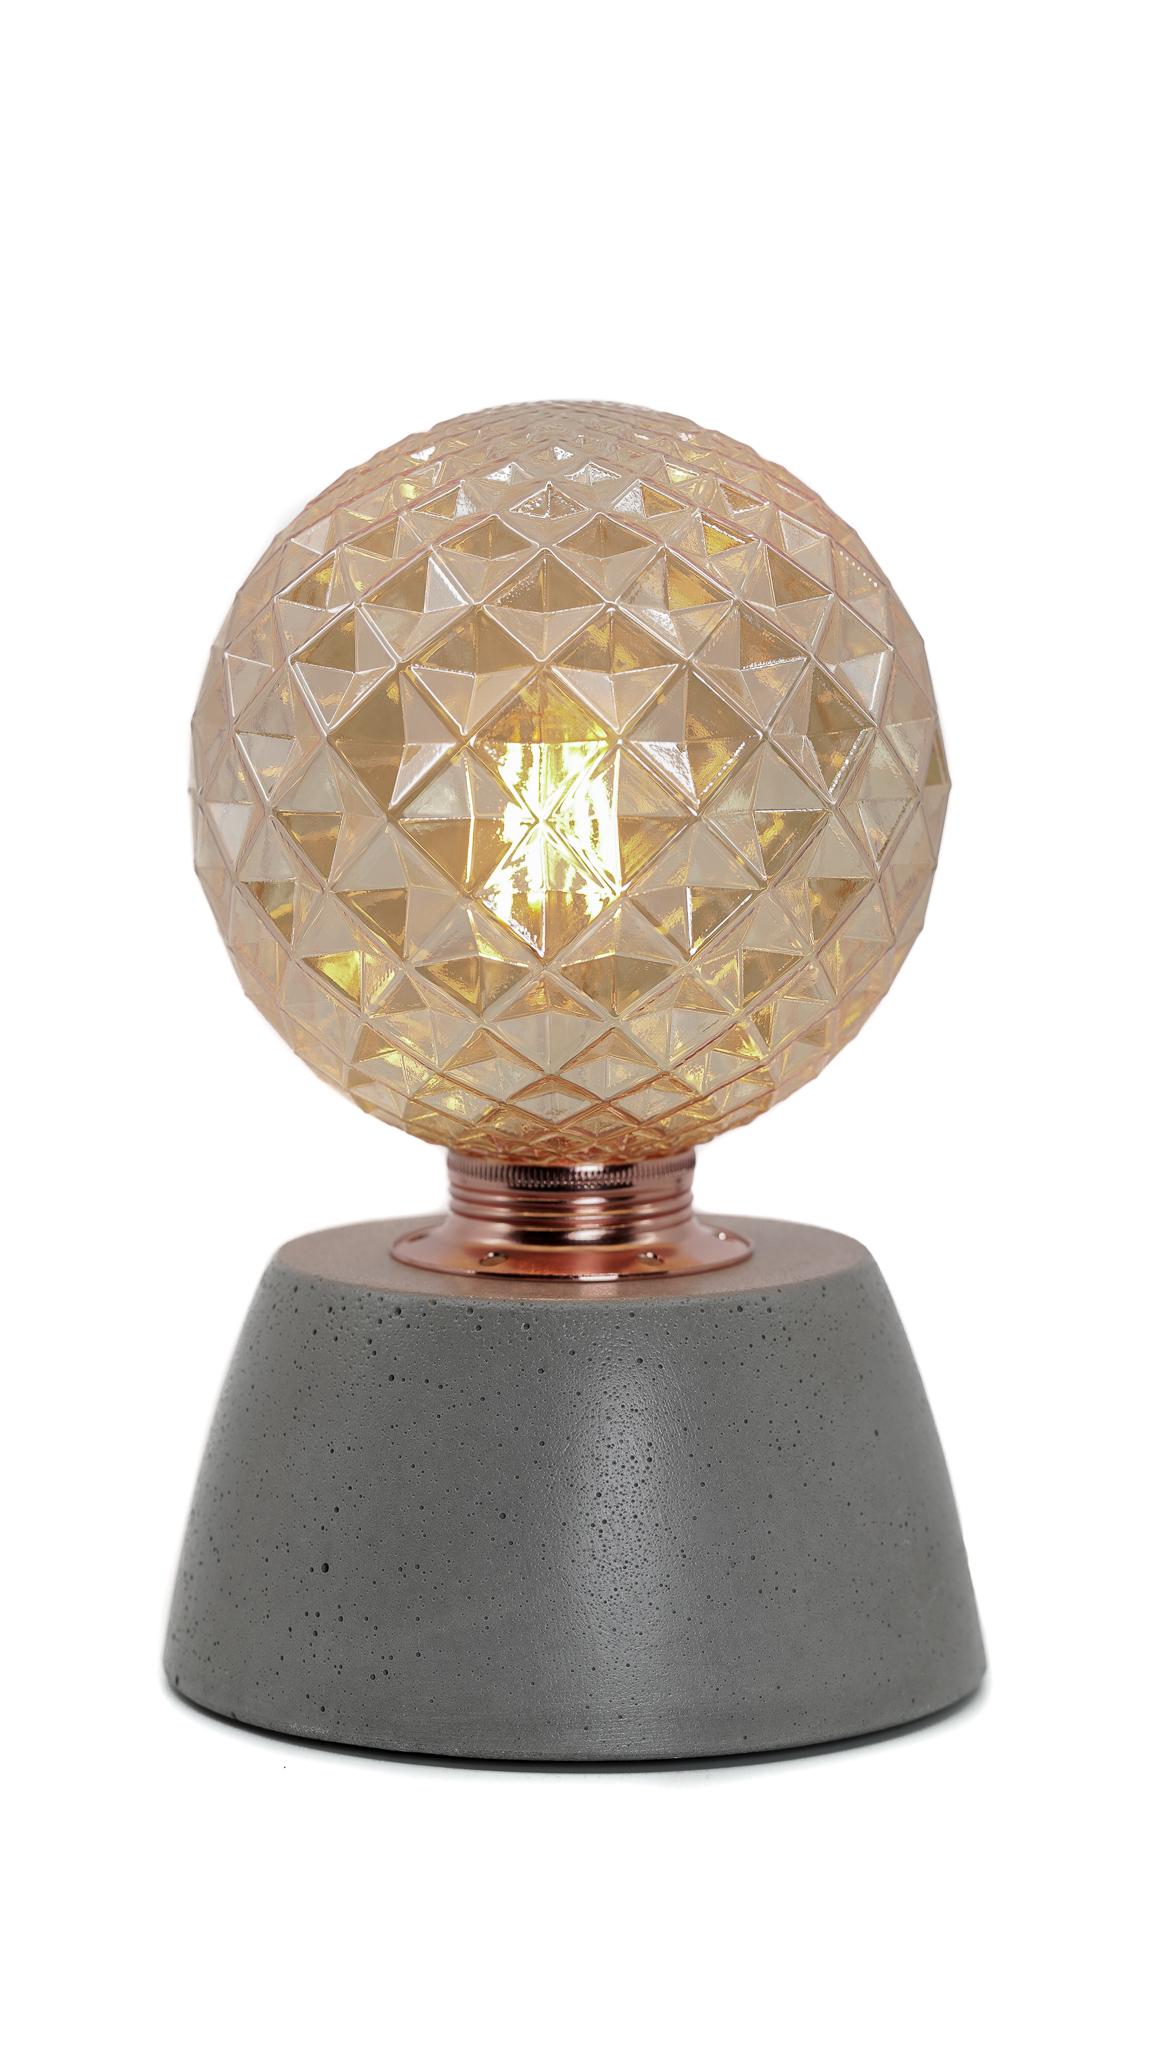 Lampe dôme diamant béton gris fabrication artisanale